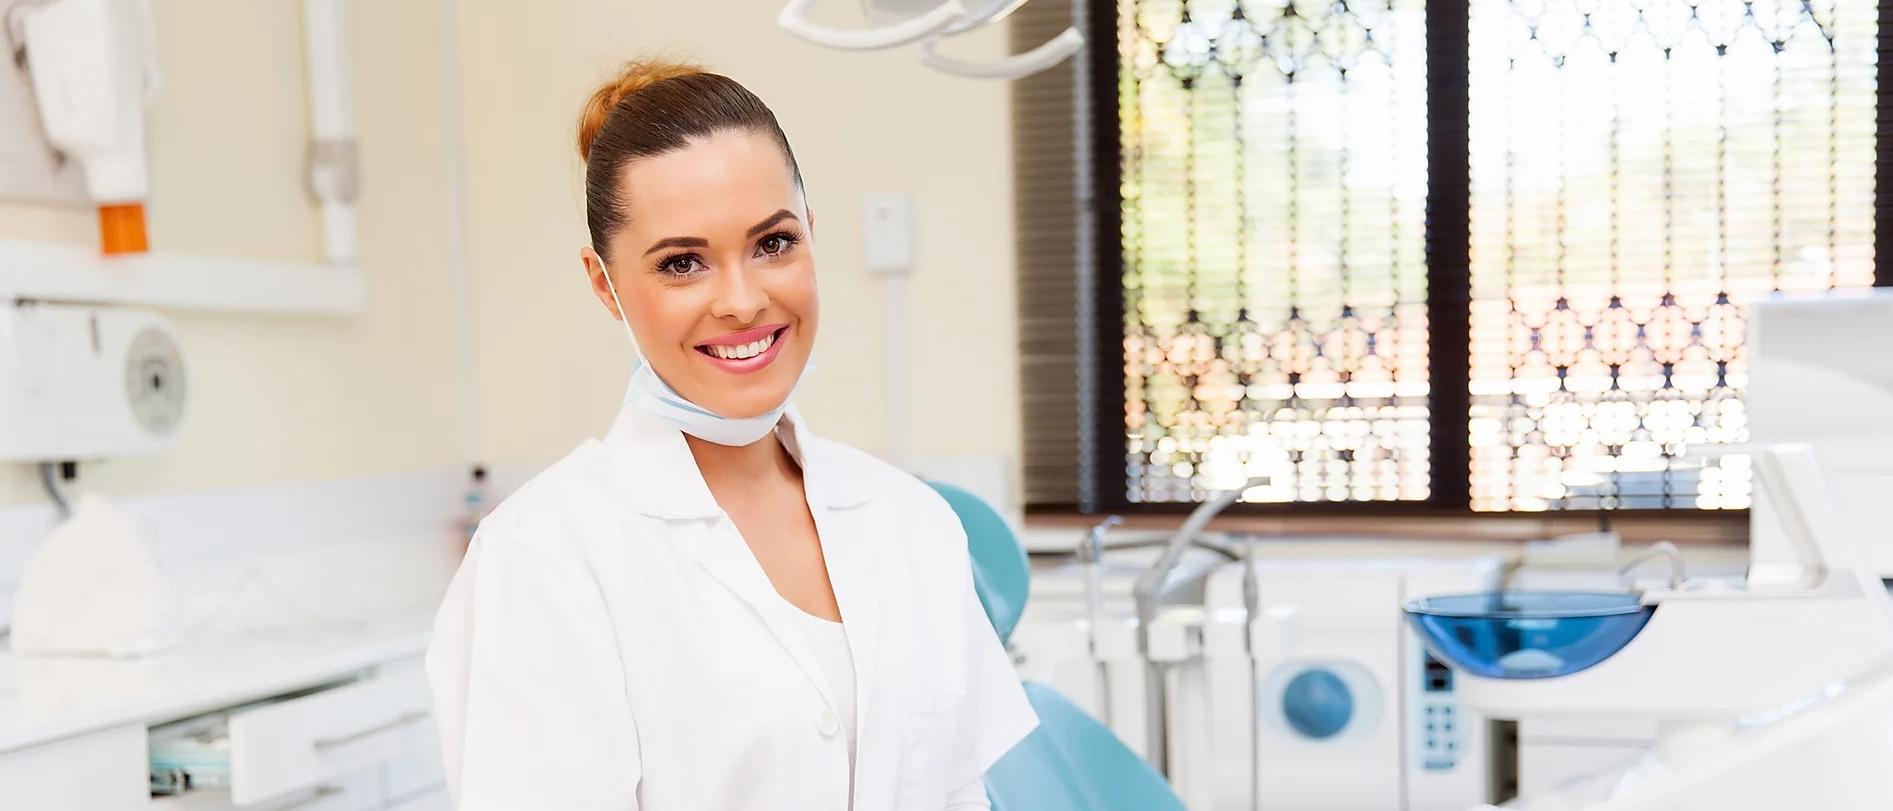 dentist_Wondershare 1_Wondershare1